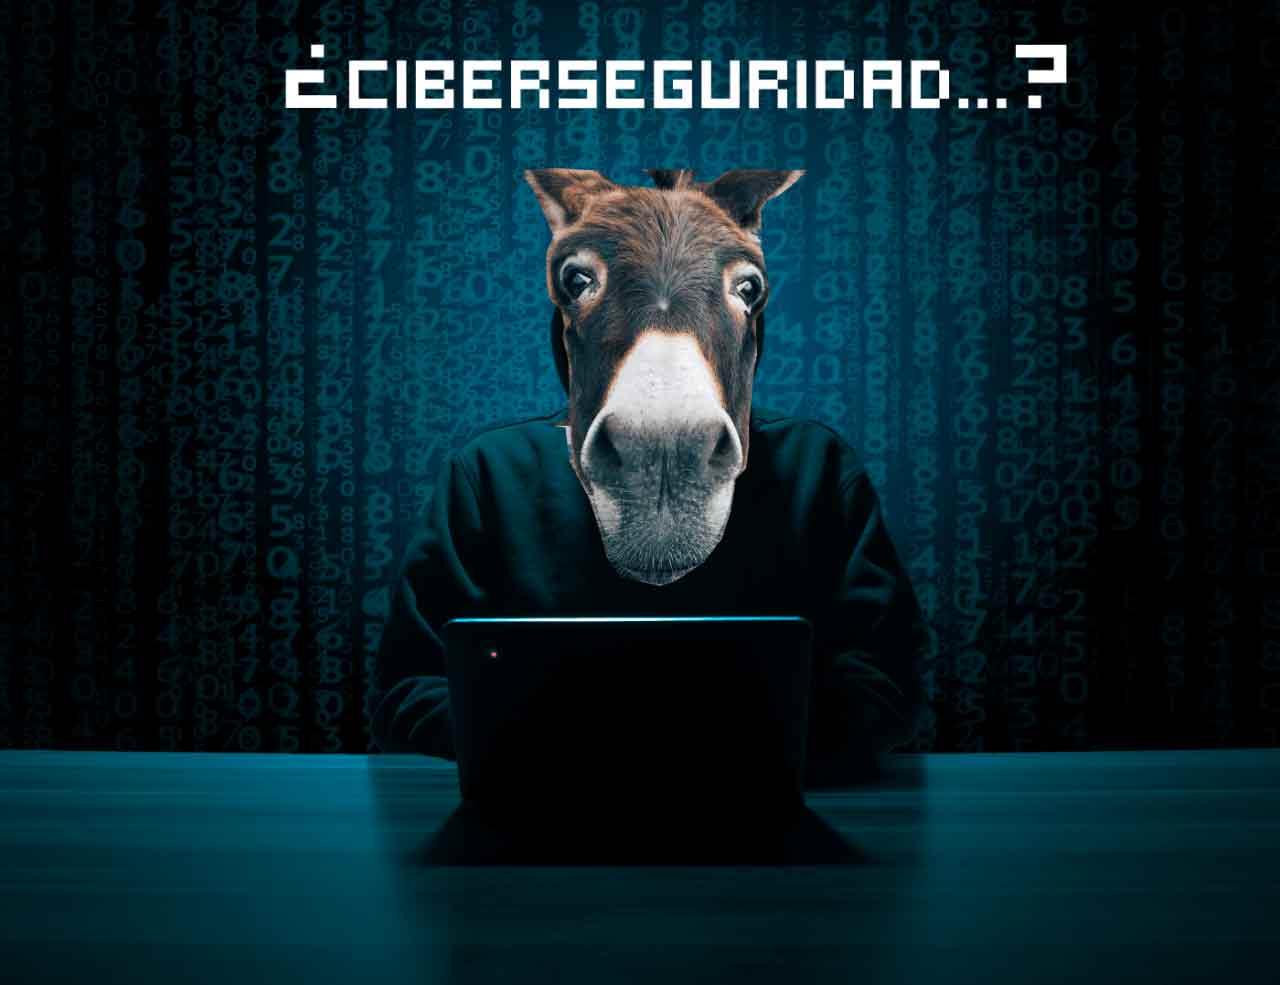 incultura de ciberseguridad en España